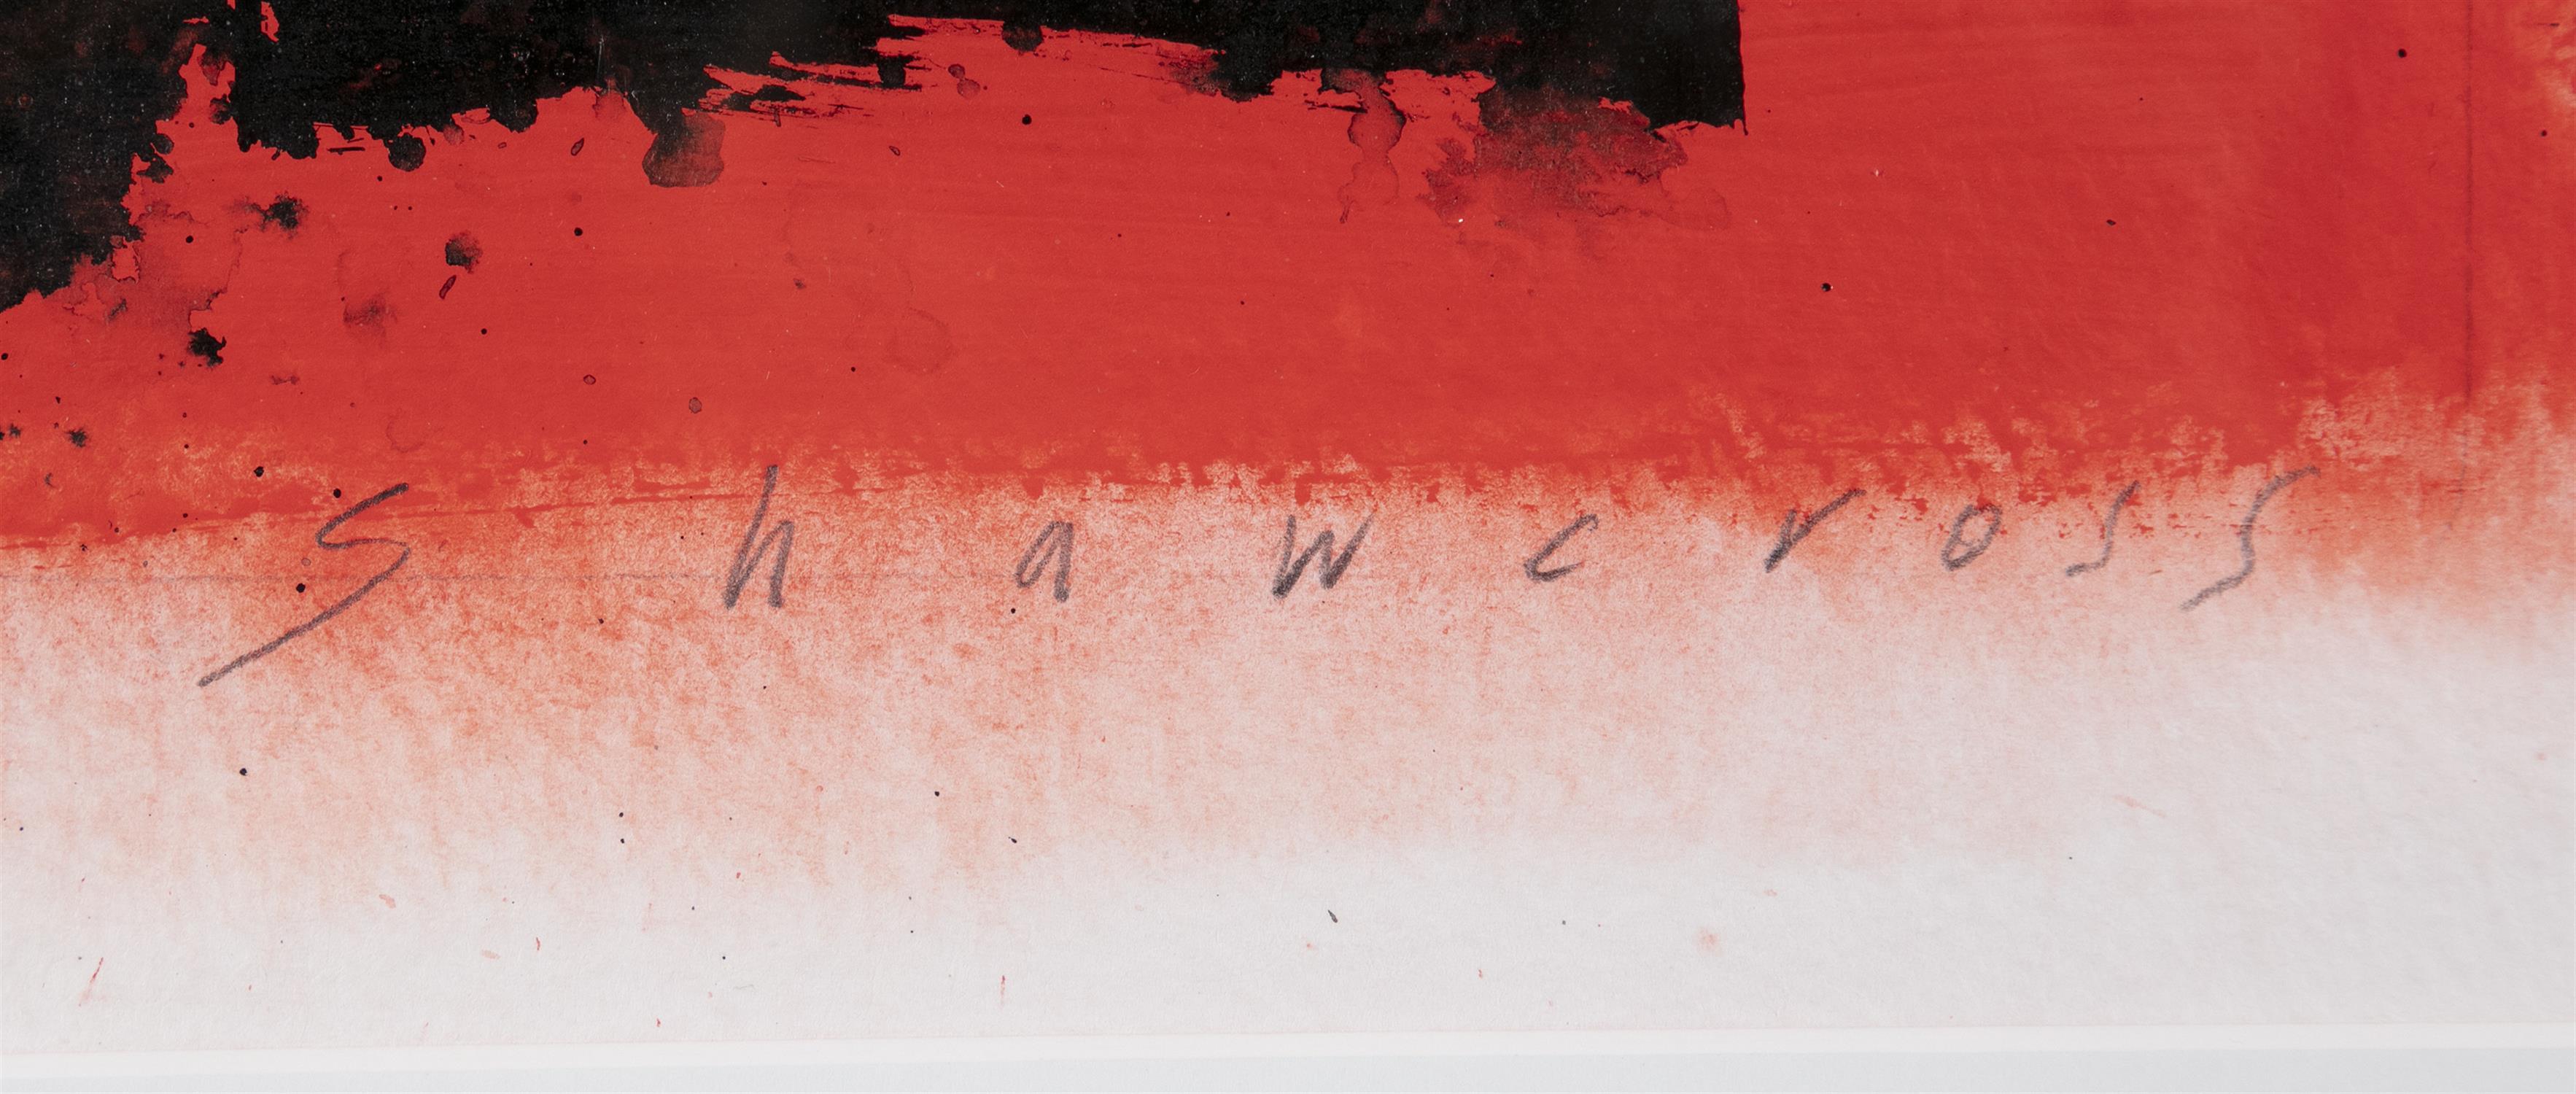 "Neil Shawcross RHA RUA (b.1940) Chair Watercolour, 32 x 23cm (12½ x 9"") Signed and dated 2007 - Image 3 of 5"